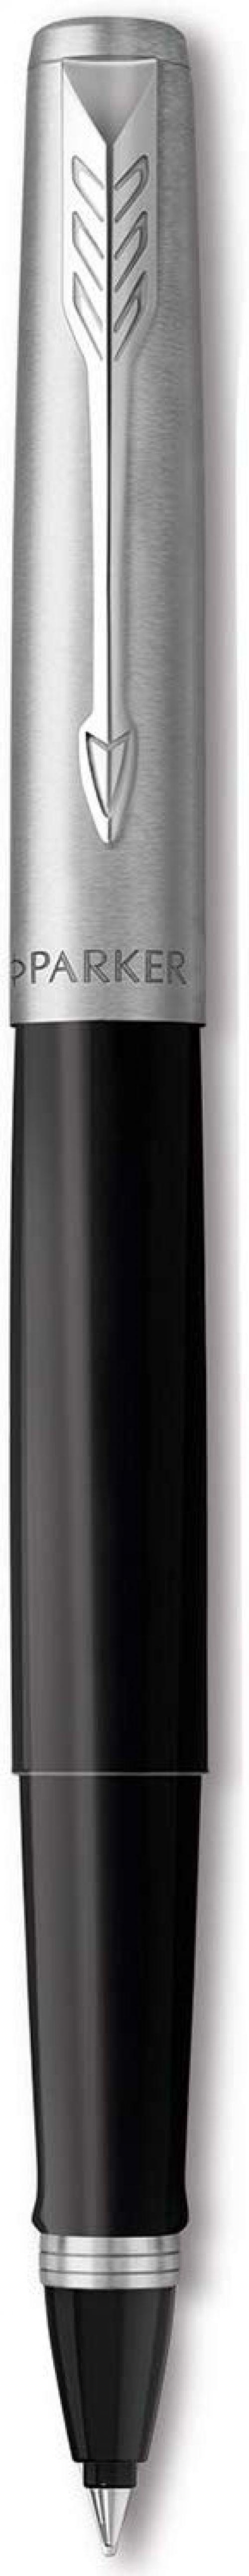 Parker Jotter Rollerball Pen Black/Stainless Steel Barrel Black Ink